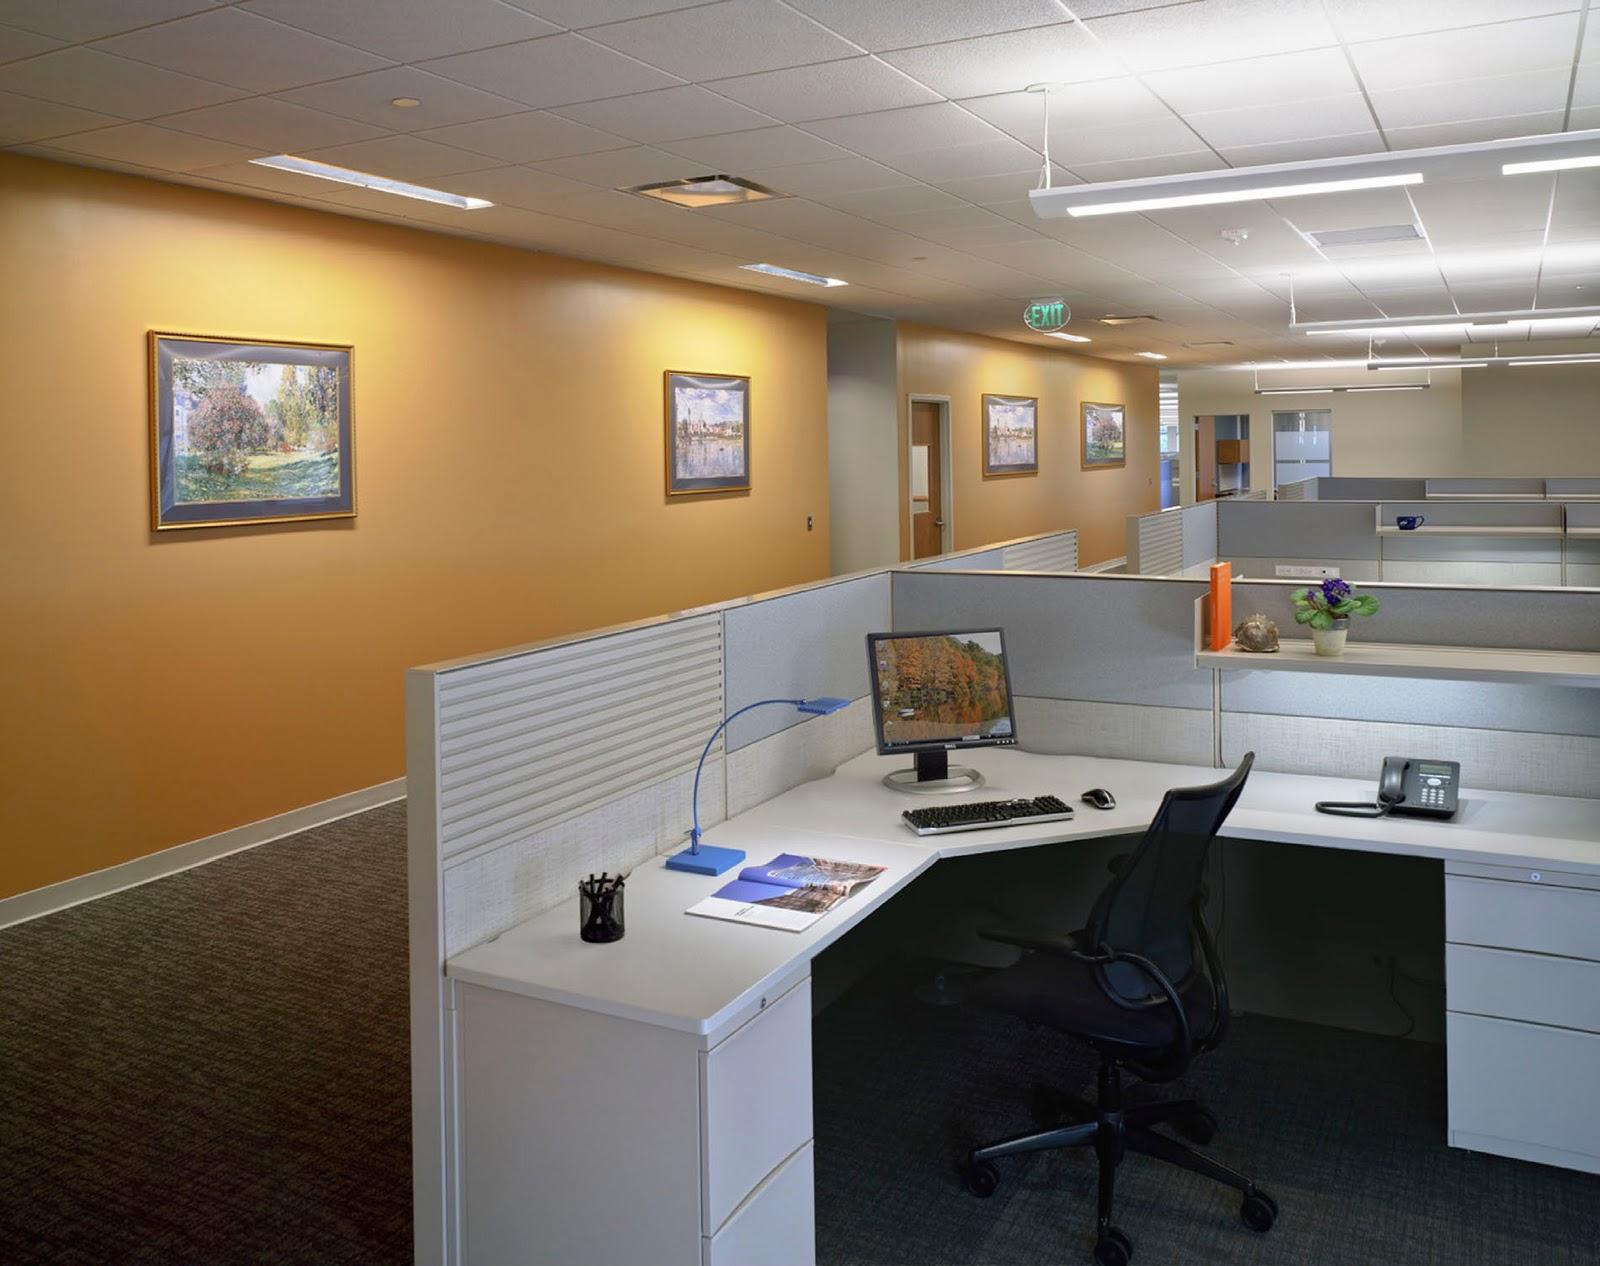 cornerstone press november 2011 - Interior Design Leed Certification